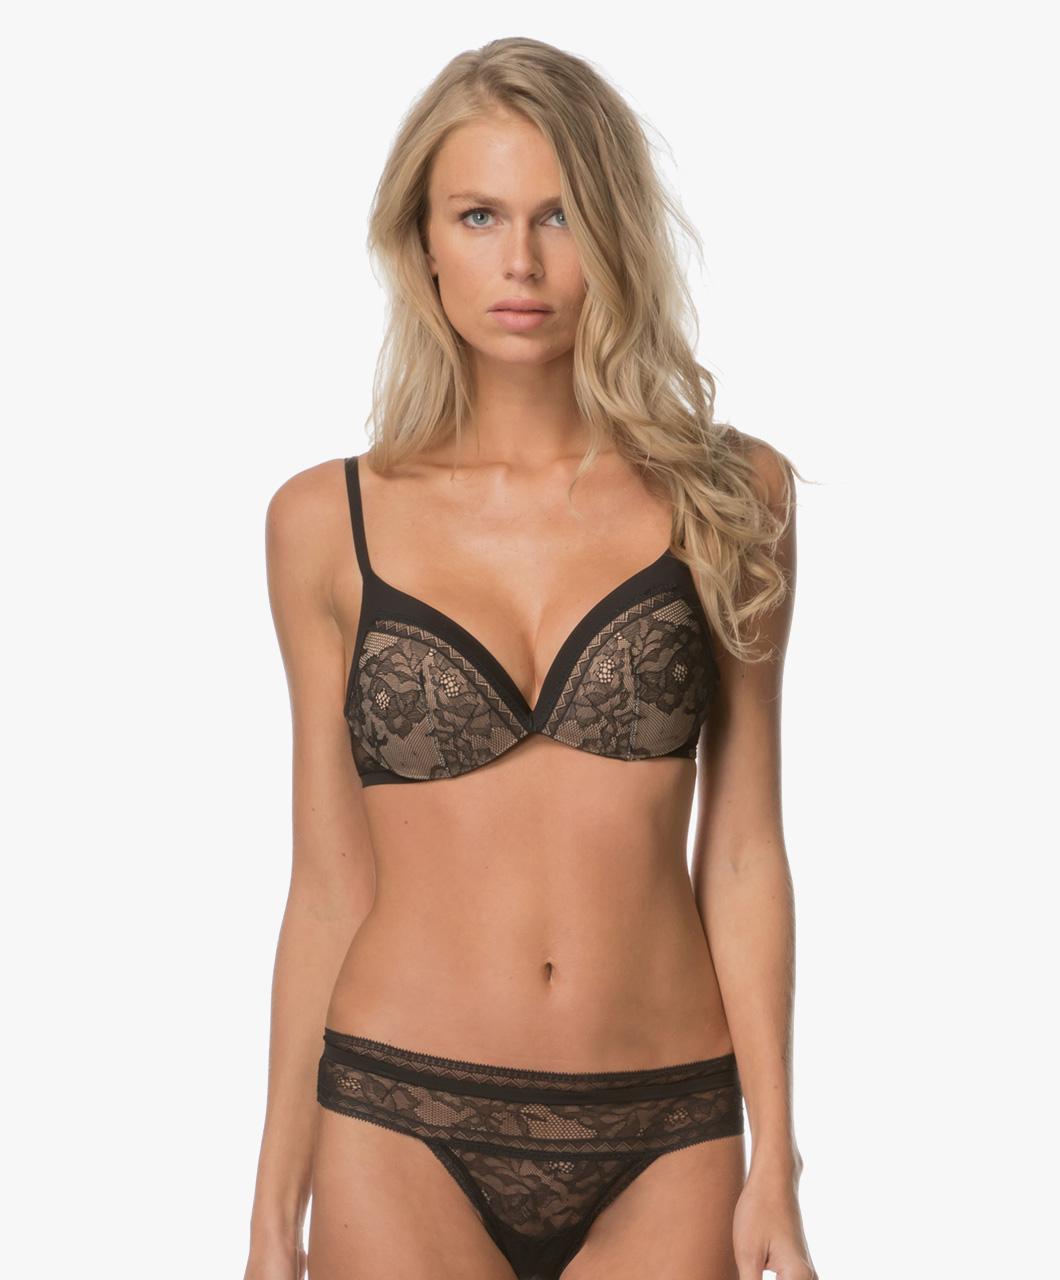 1ed3df8748523 Calvin Klein Black Obsess Push Up Plunge Bra - Black - qf1941e 001